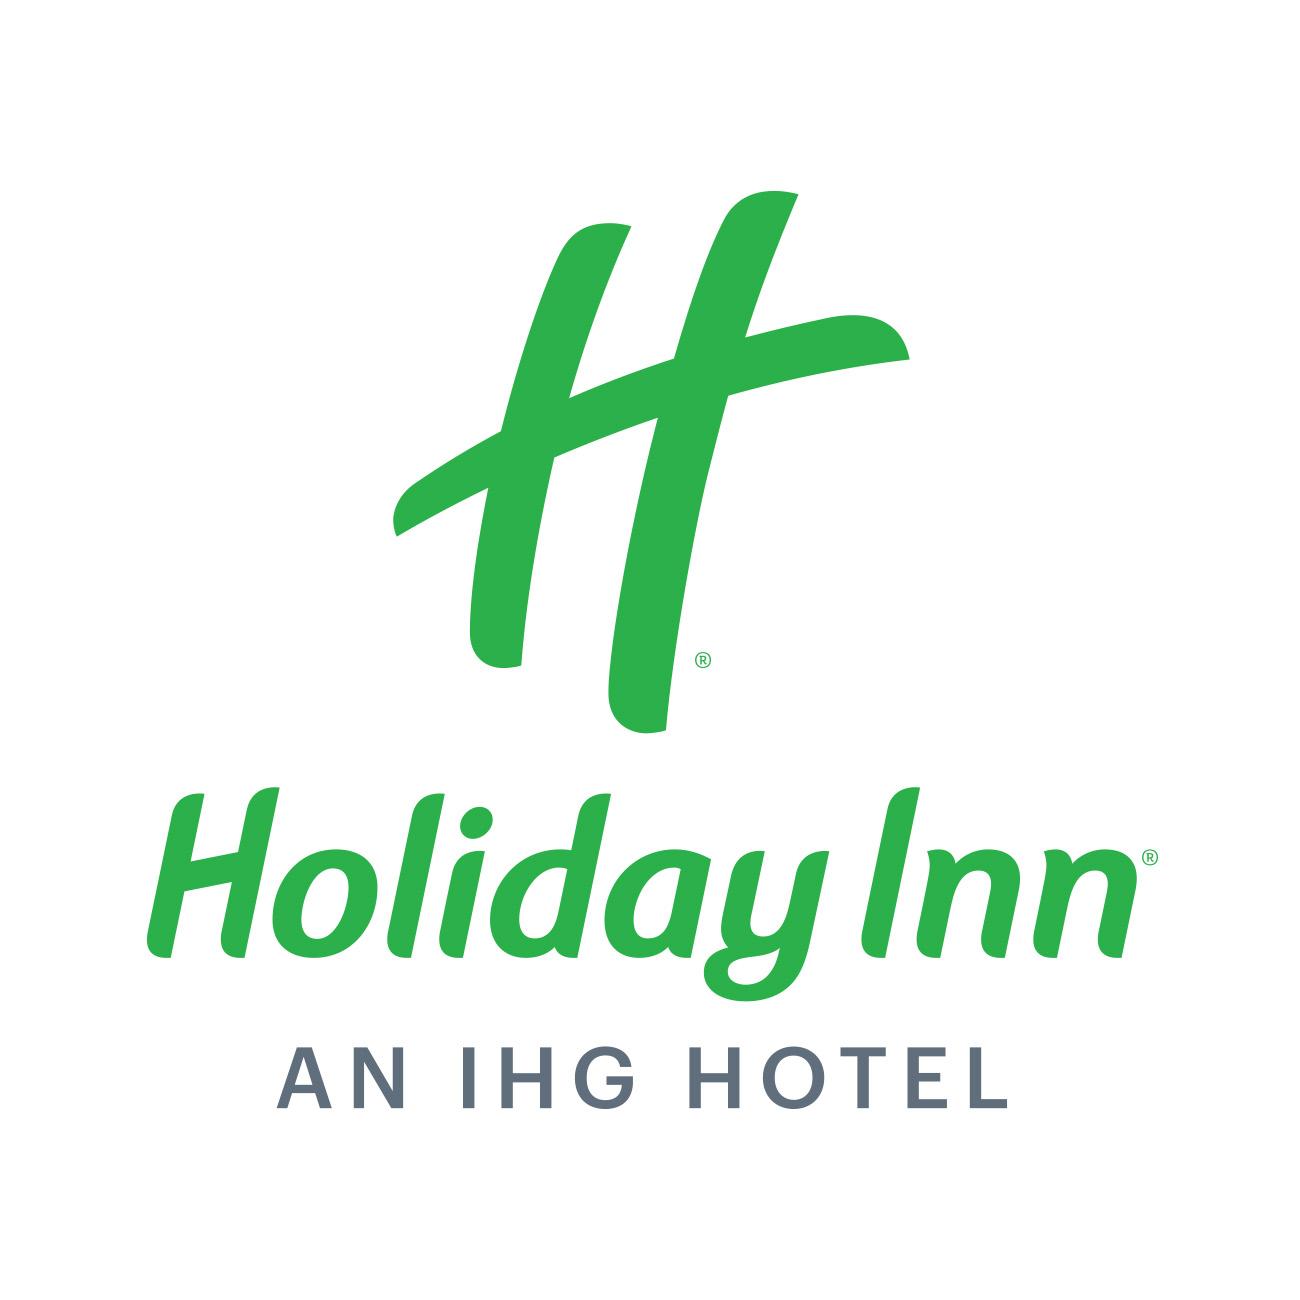 Holiday Inn 2021